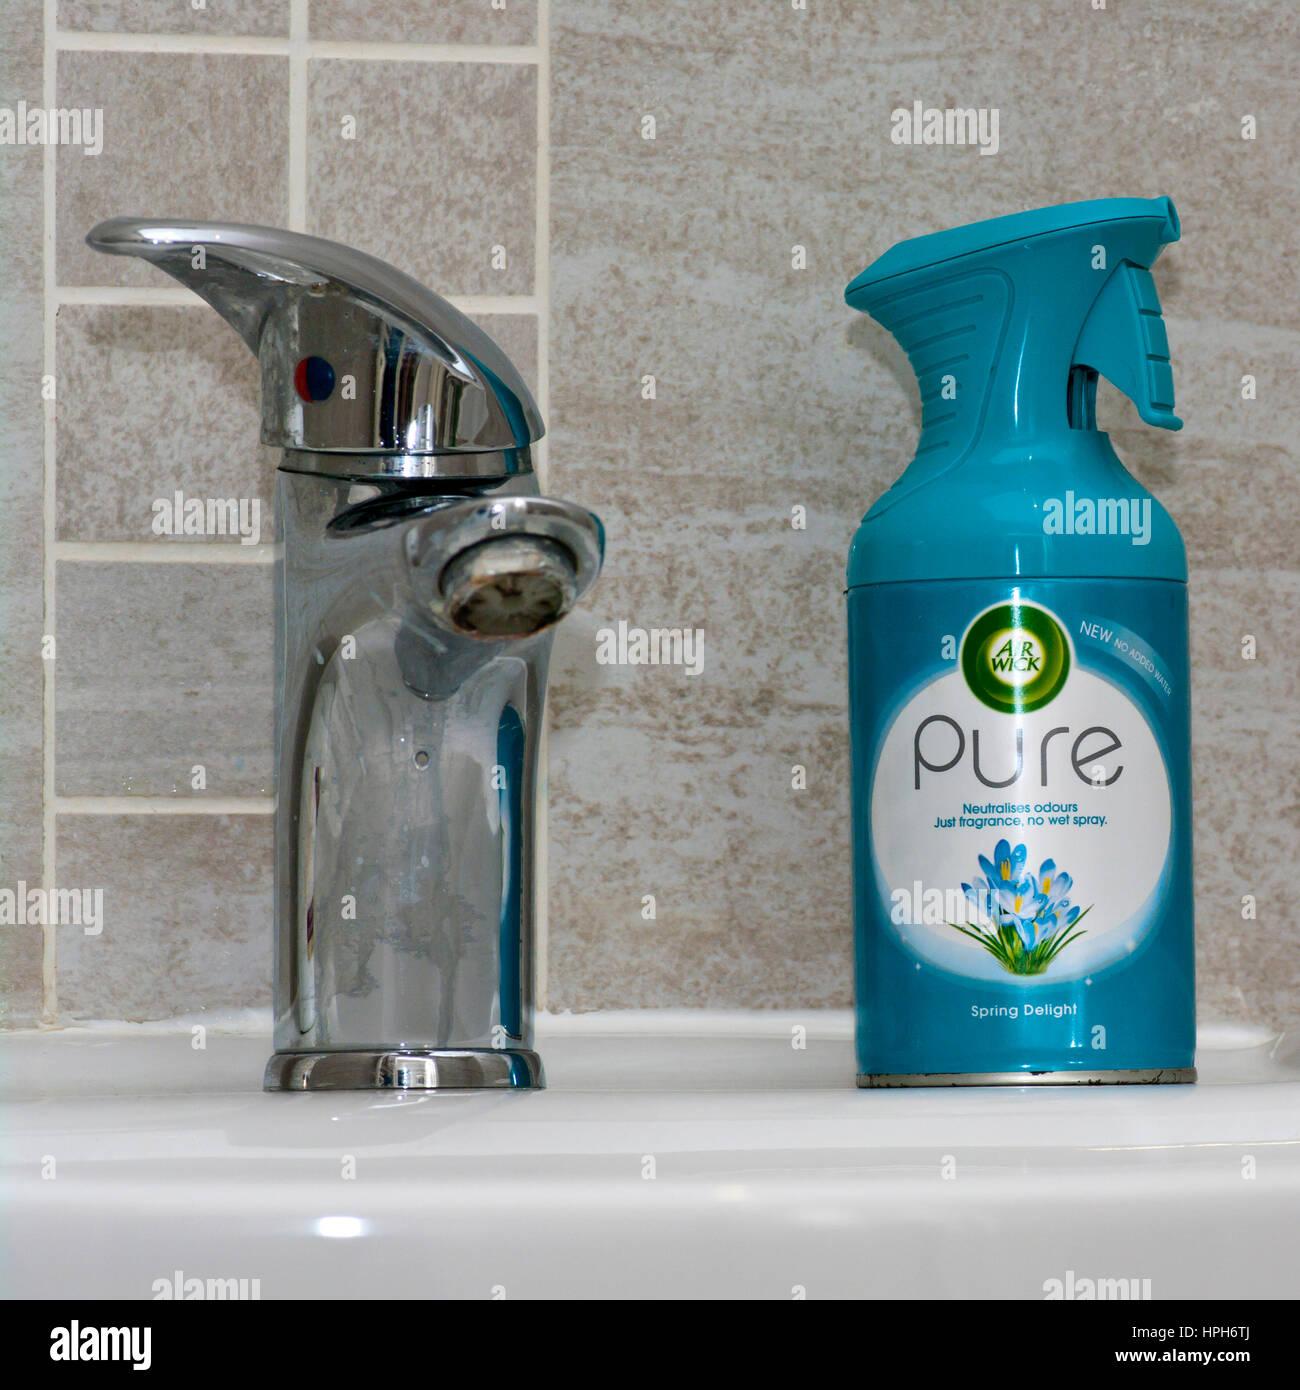 Air Wick Pure Fresh Air Spray - Stock Image